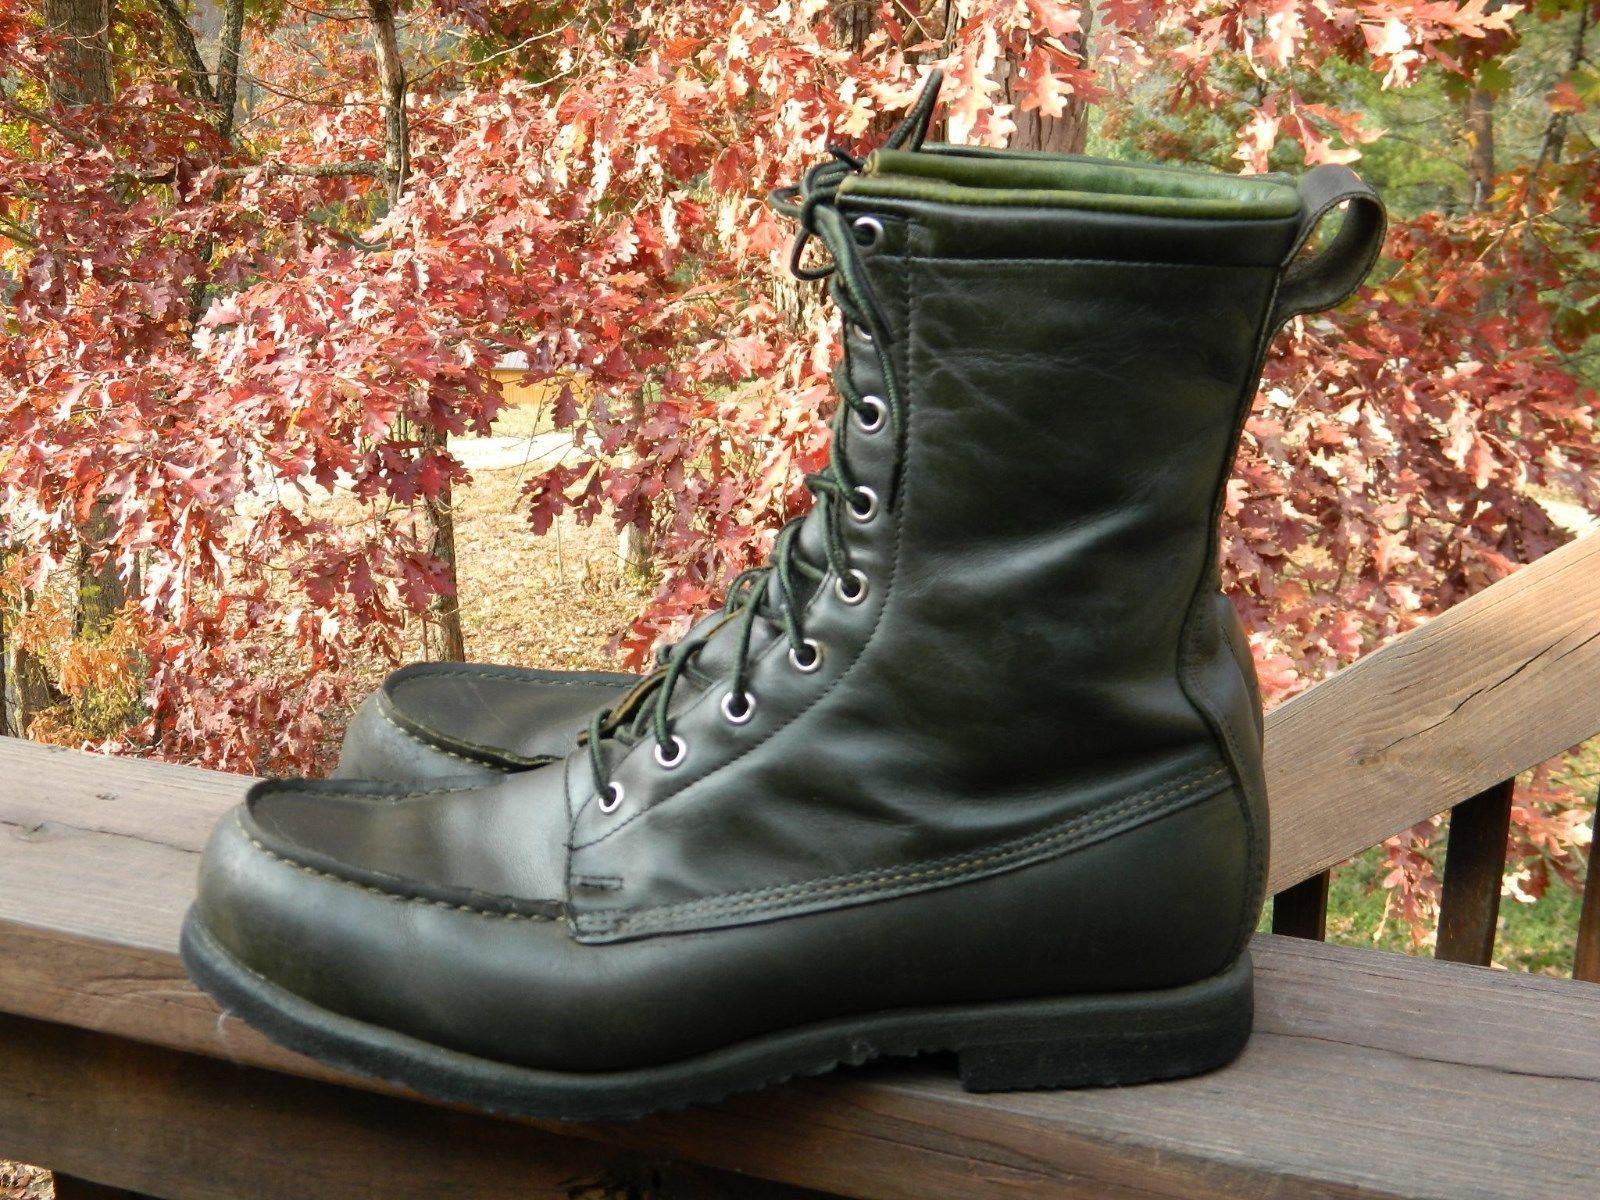 RED WING Irish Setter Rare VTG Green Moc Toe Work Hunting Sport Boots- Men's 12 https://t.co/xEjzmJXksq https://t.co/ceIv6mcN16